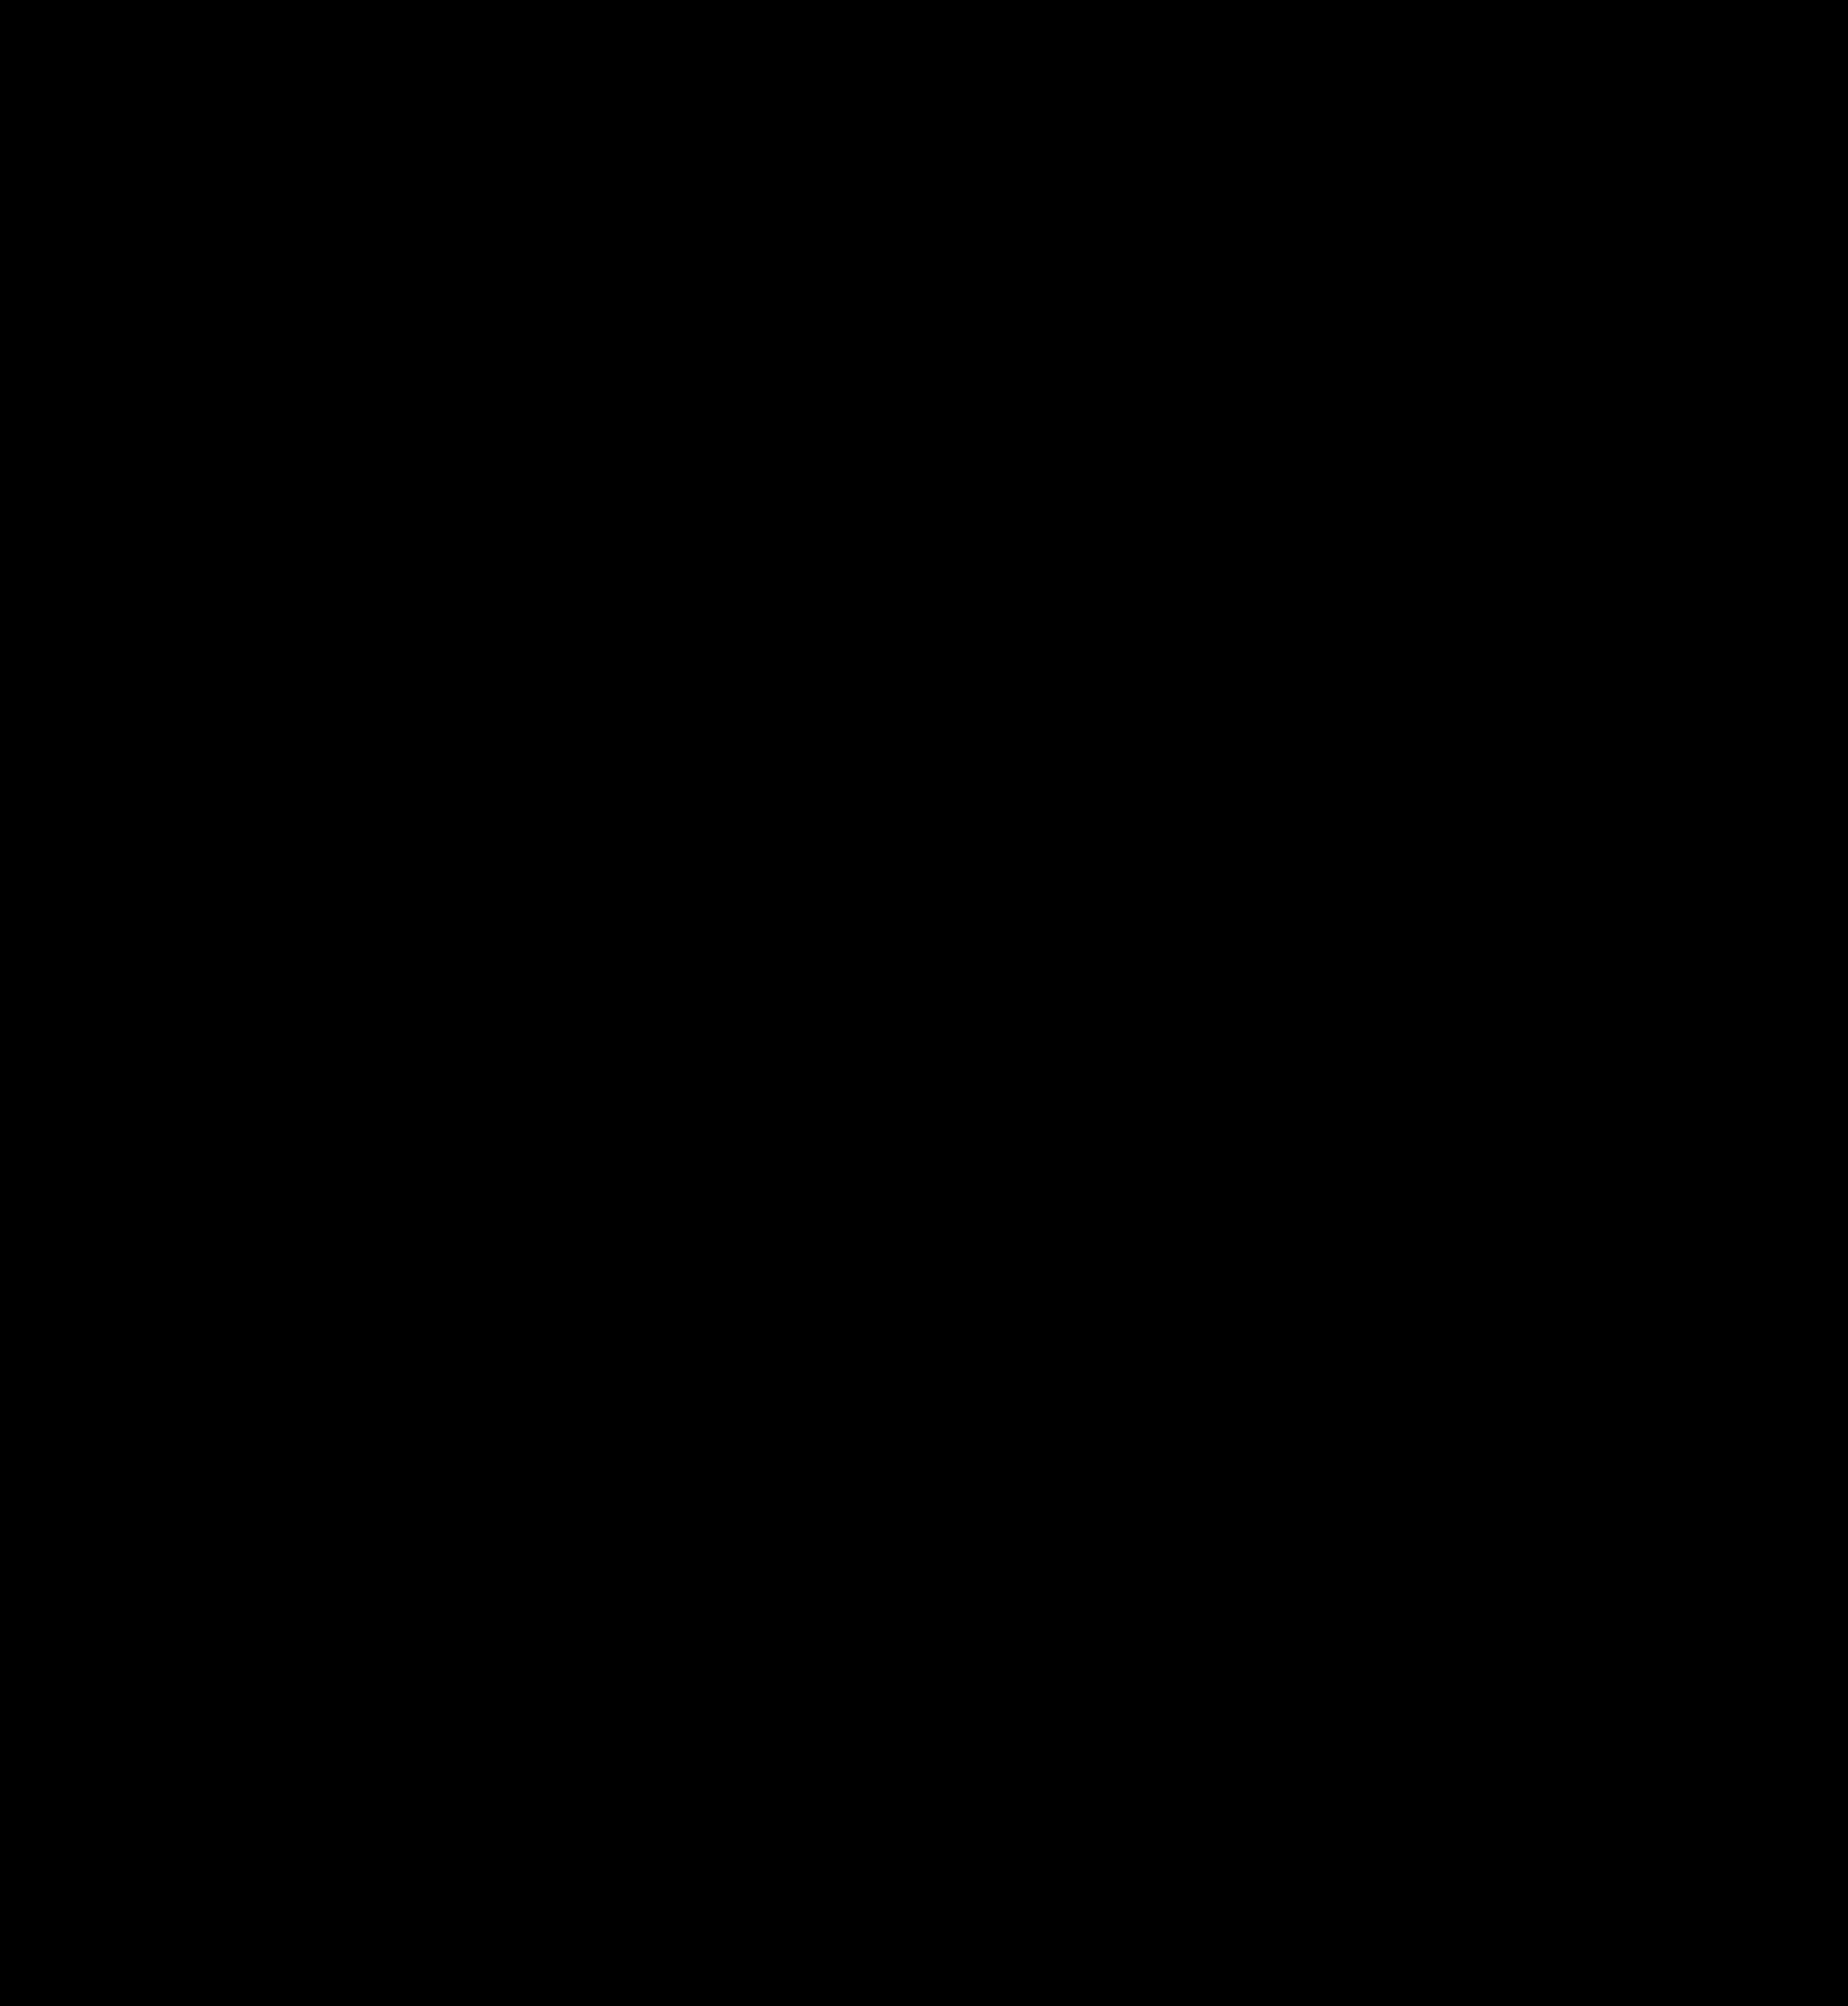 2190x2377 Lancaster Bomber Black Silhouette Png Clipart